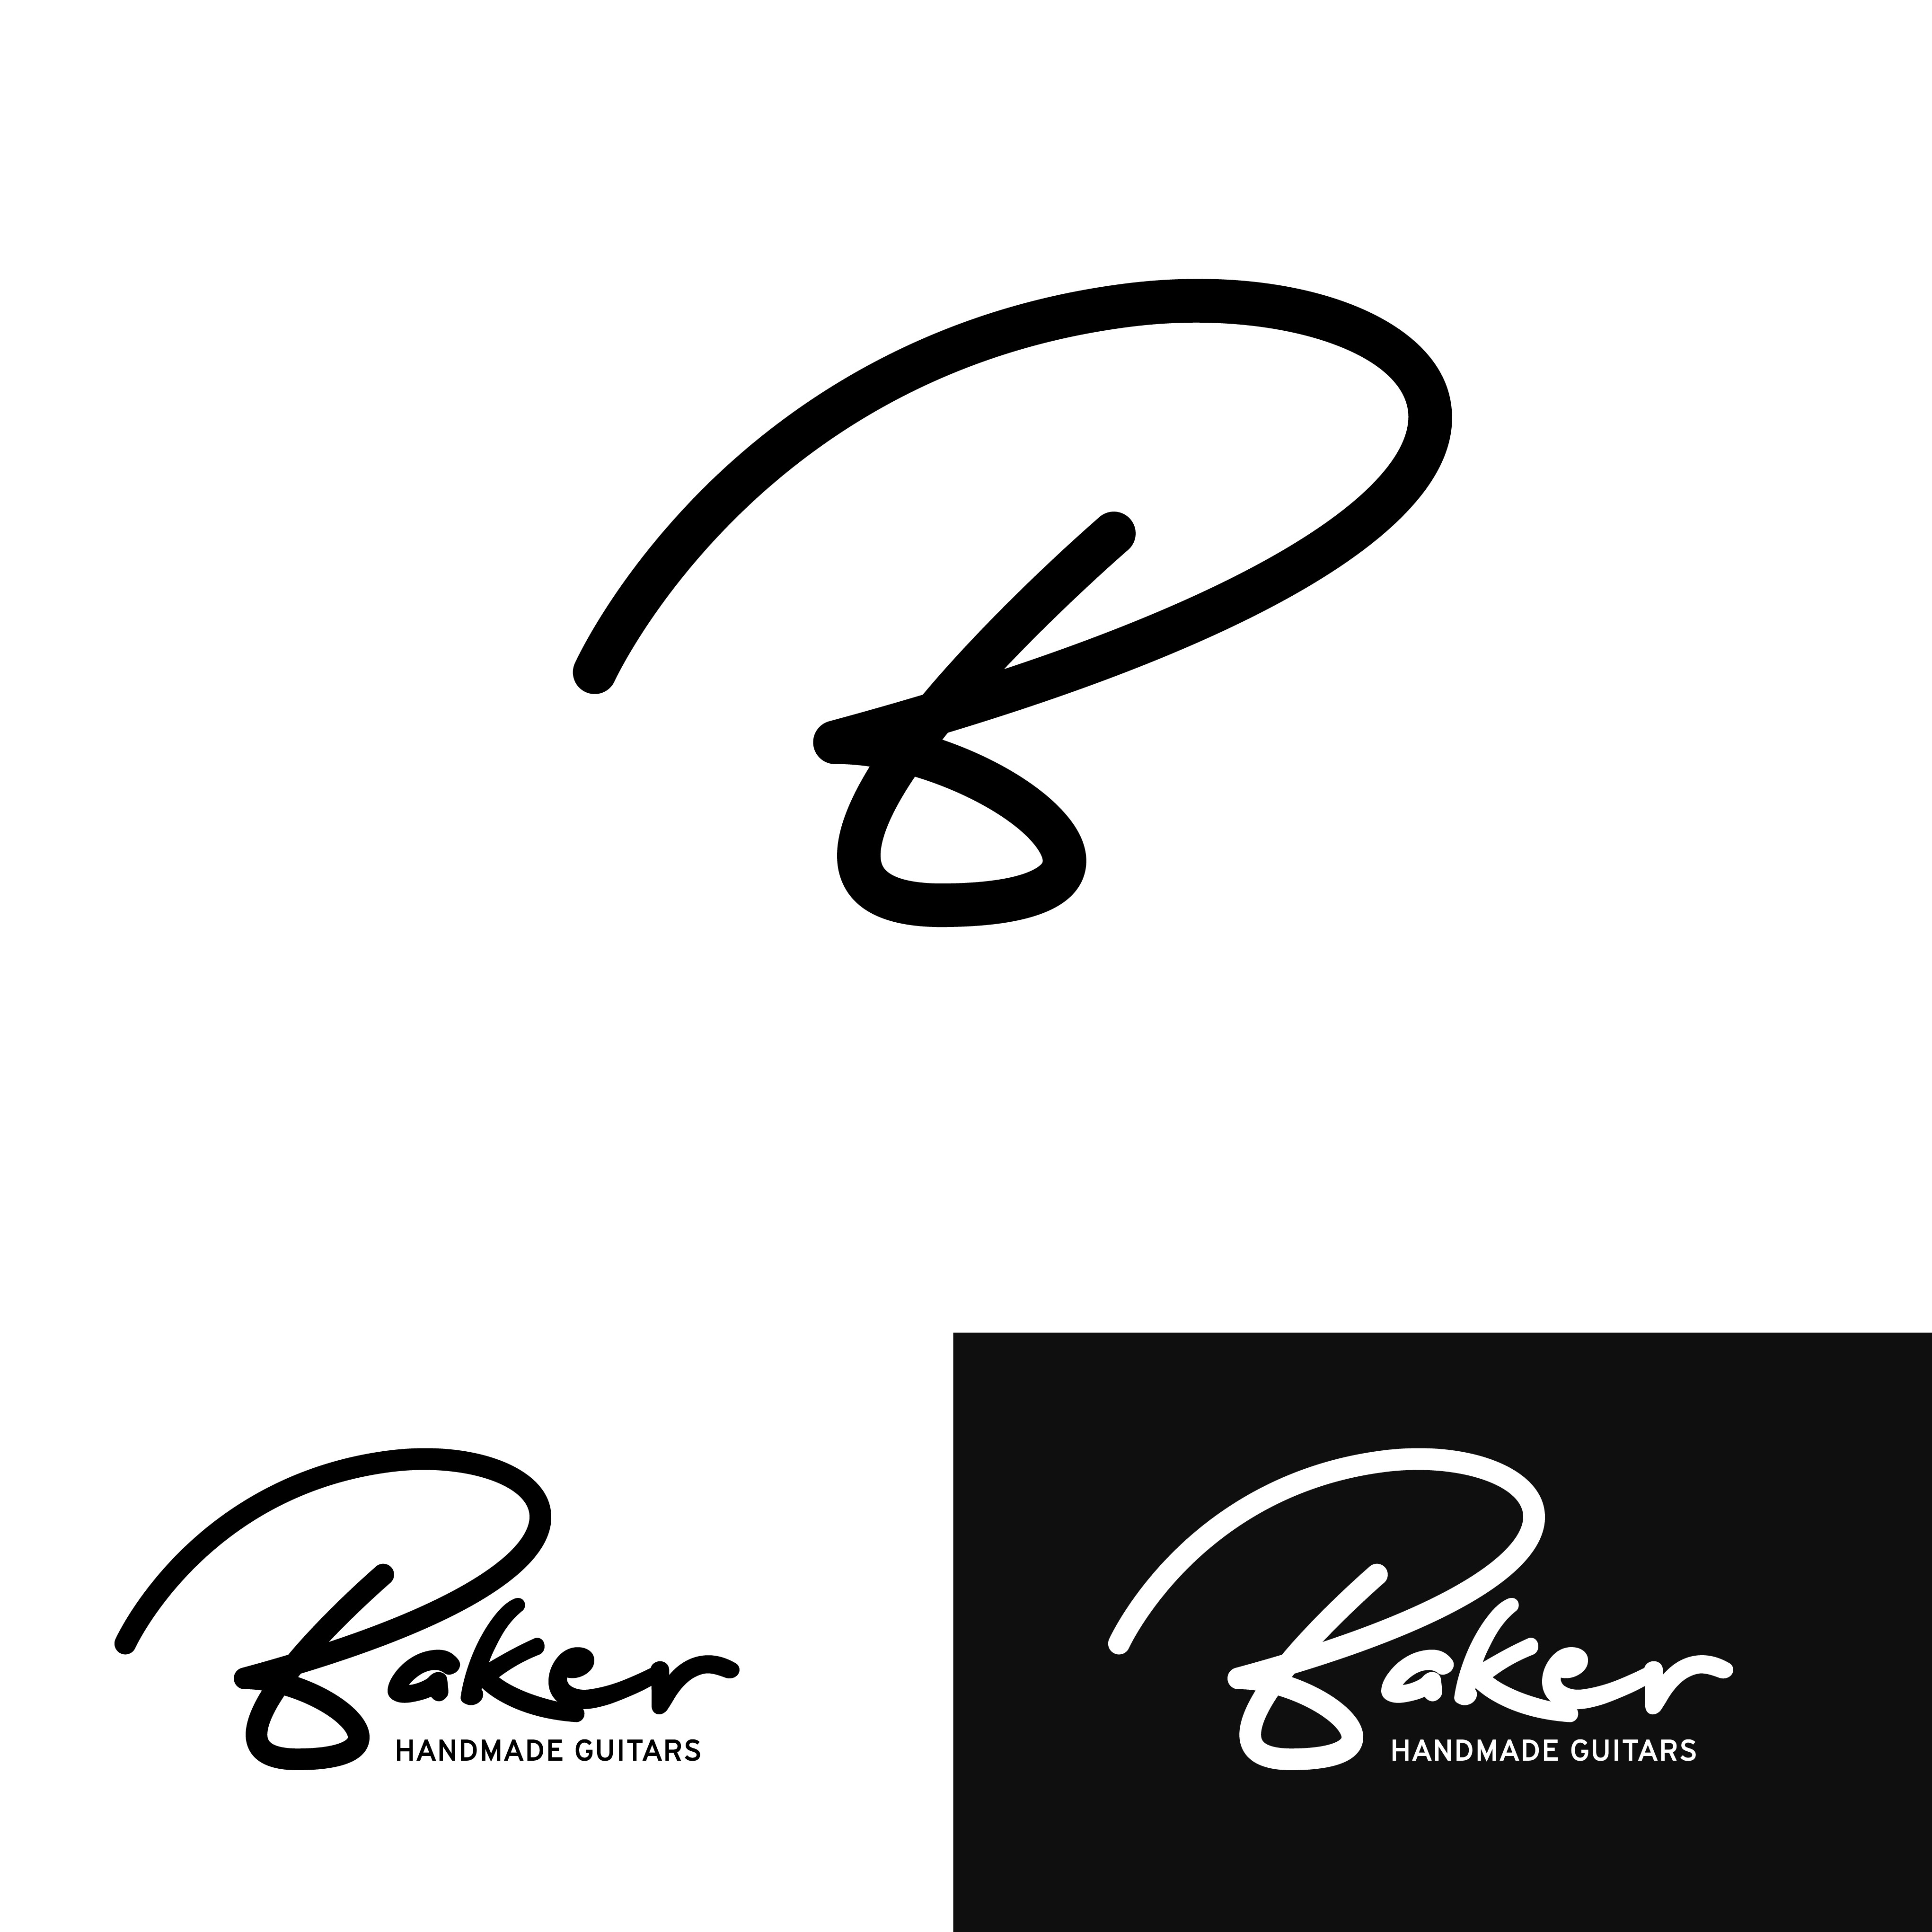 Dj Baker Guitars